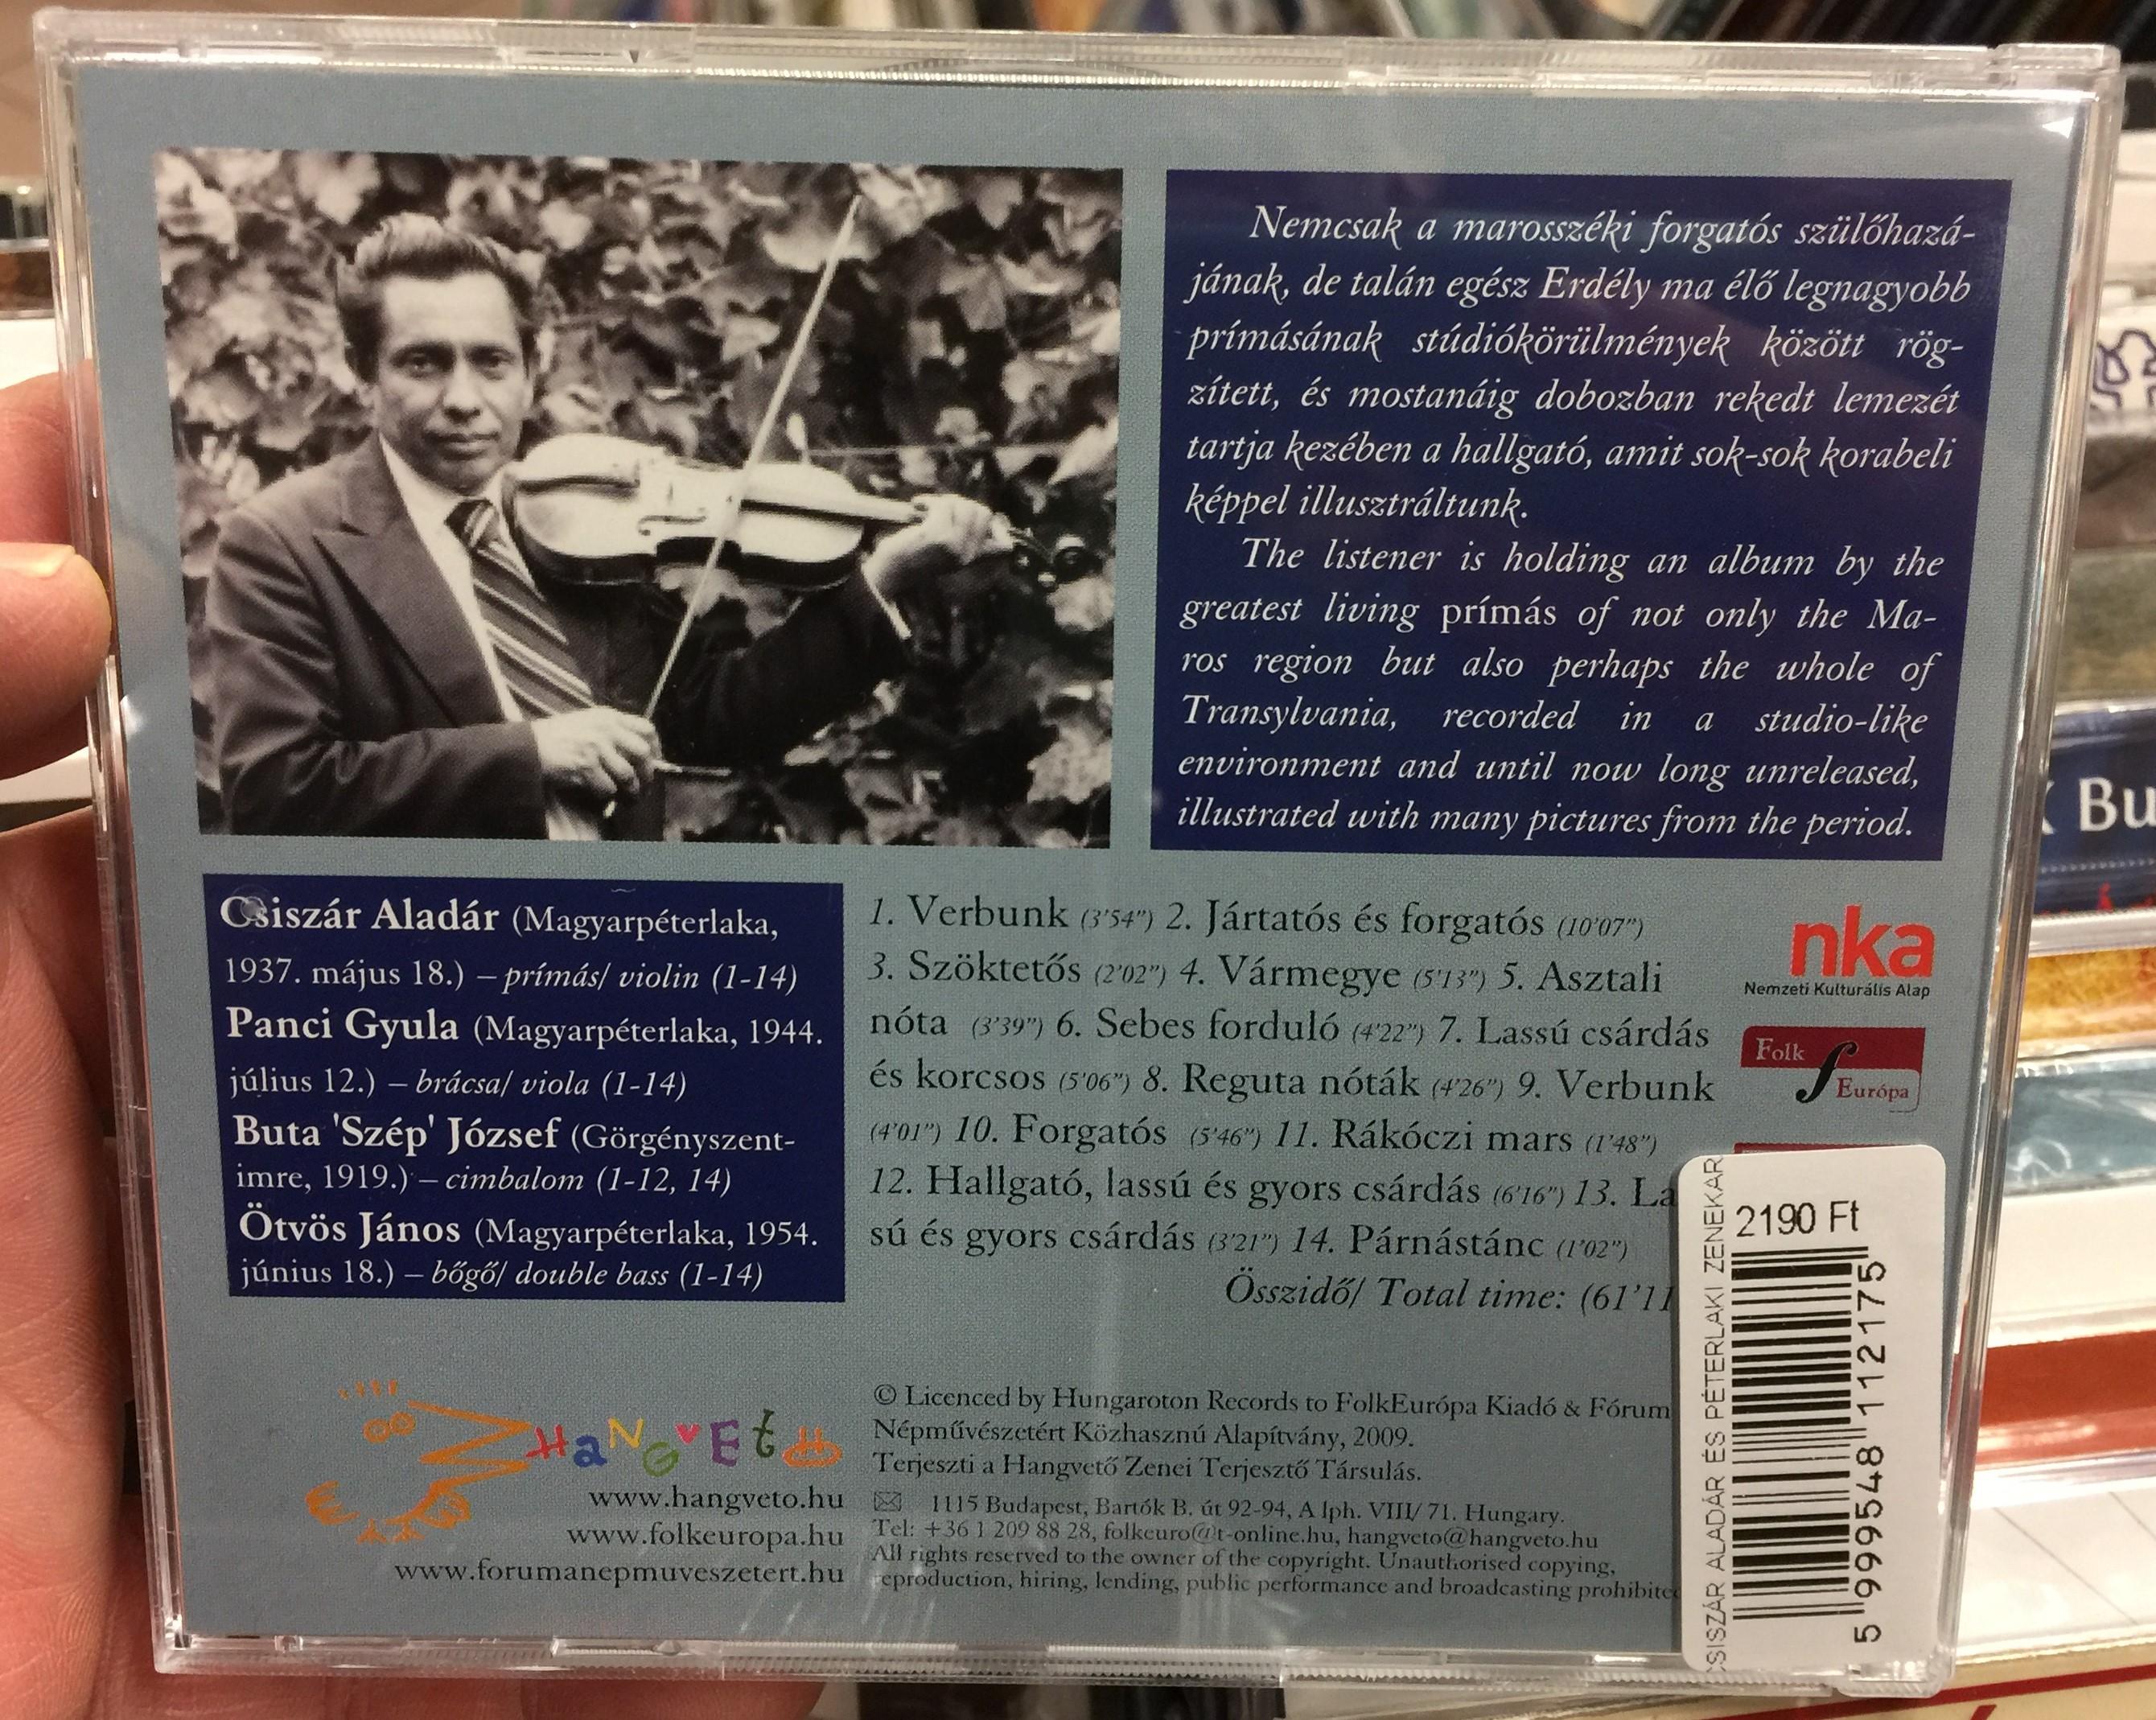 csisz-r-alad-r-es-peterlaki-zenekara-his-peterlaka-band-fekete-antal-gyujteseibol-10.-folk-europa-audio-cd-2009-5999548112175-2-.jpg